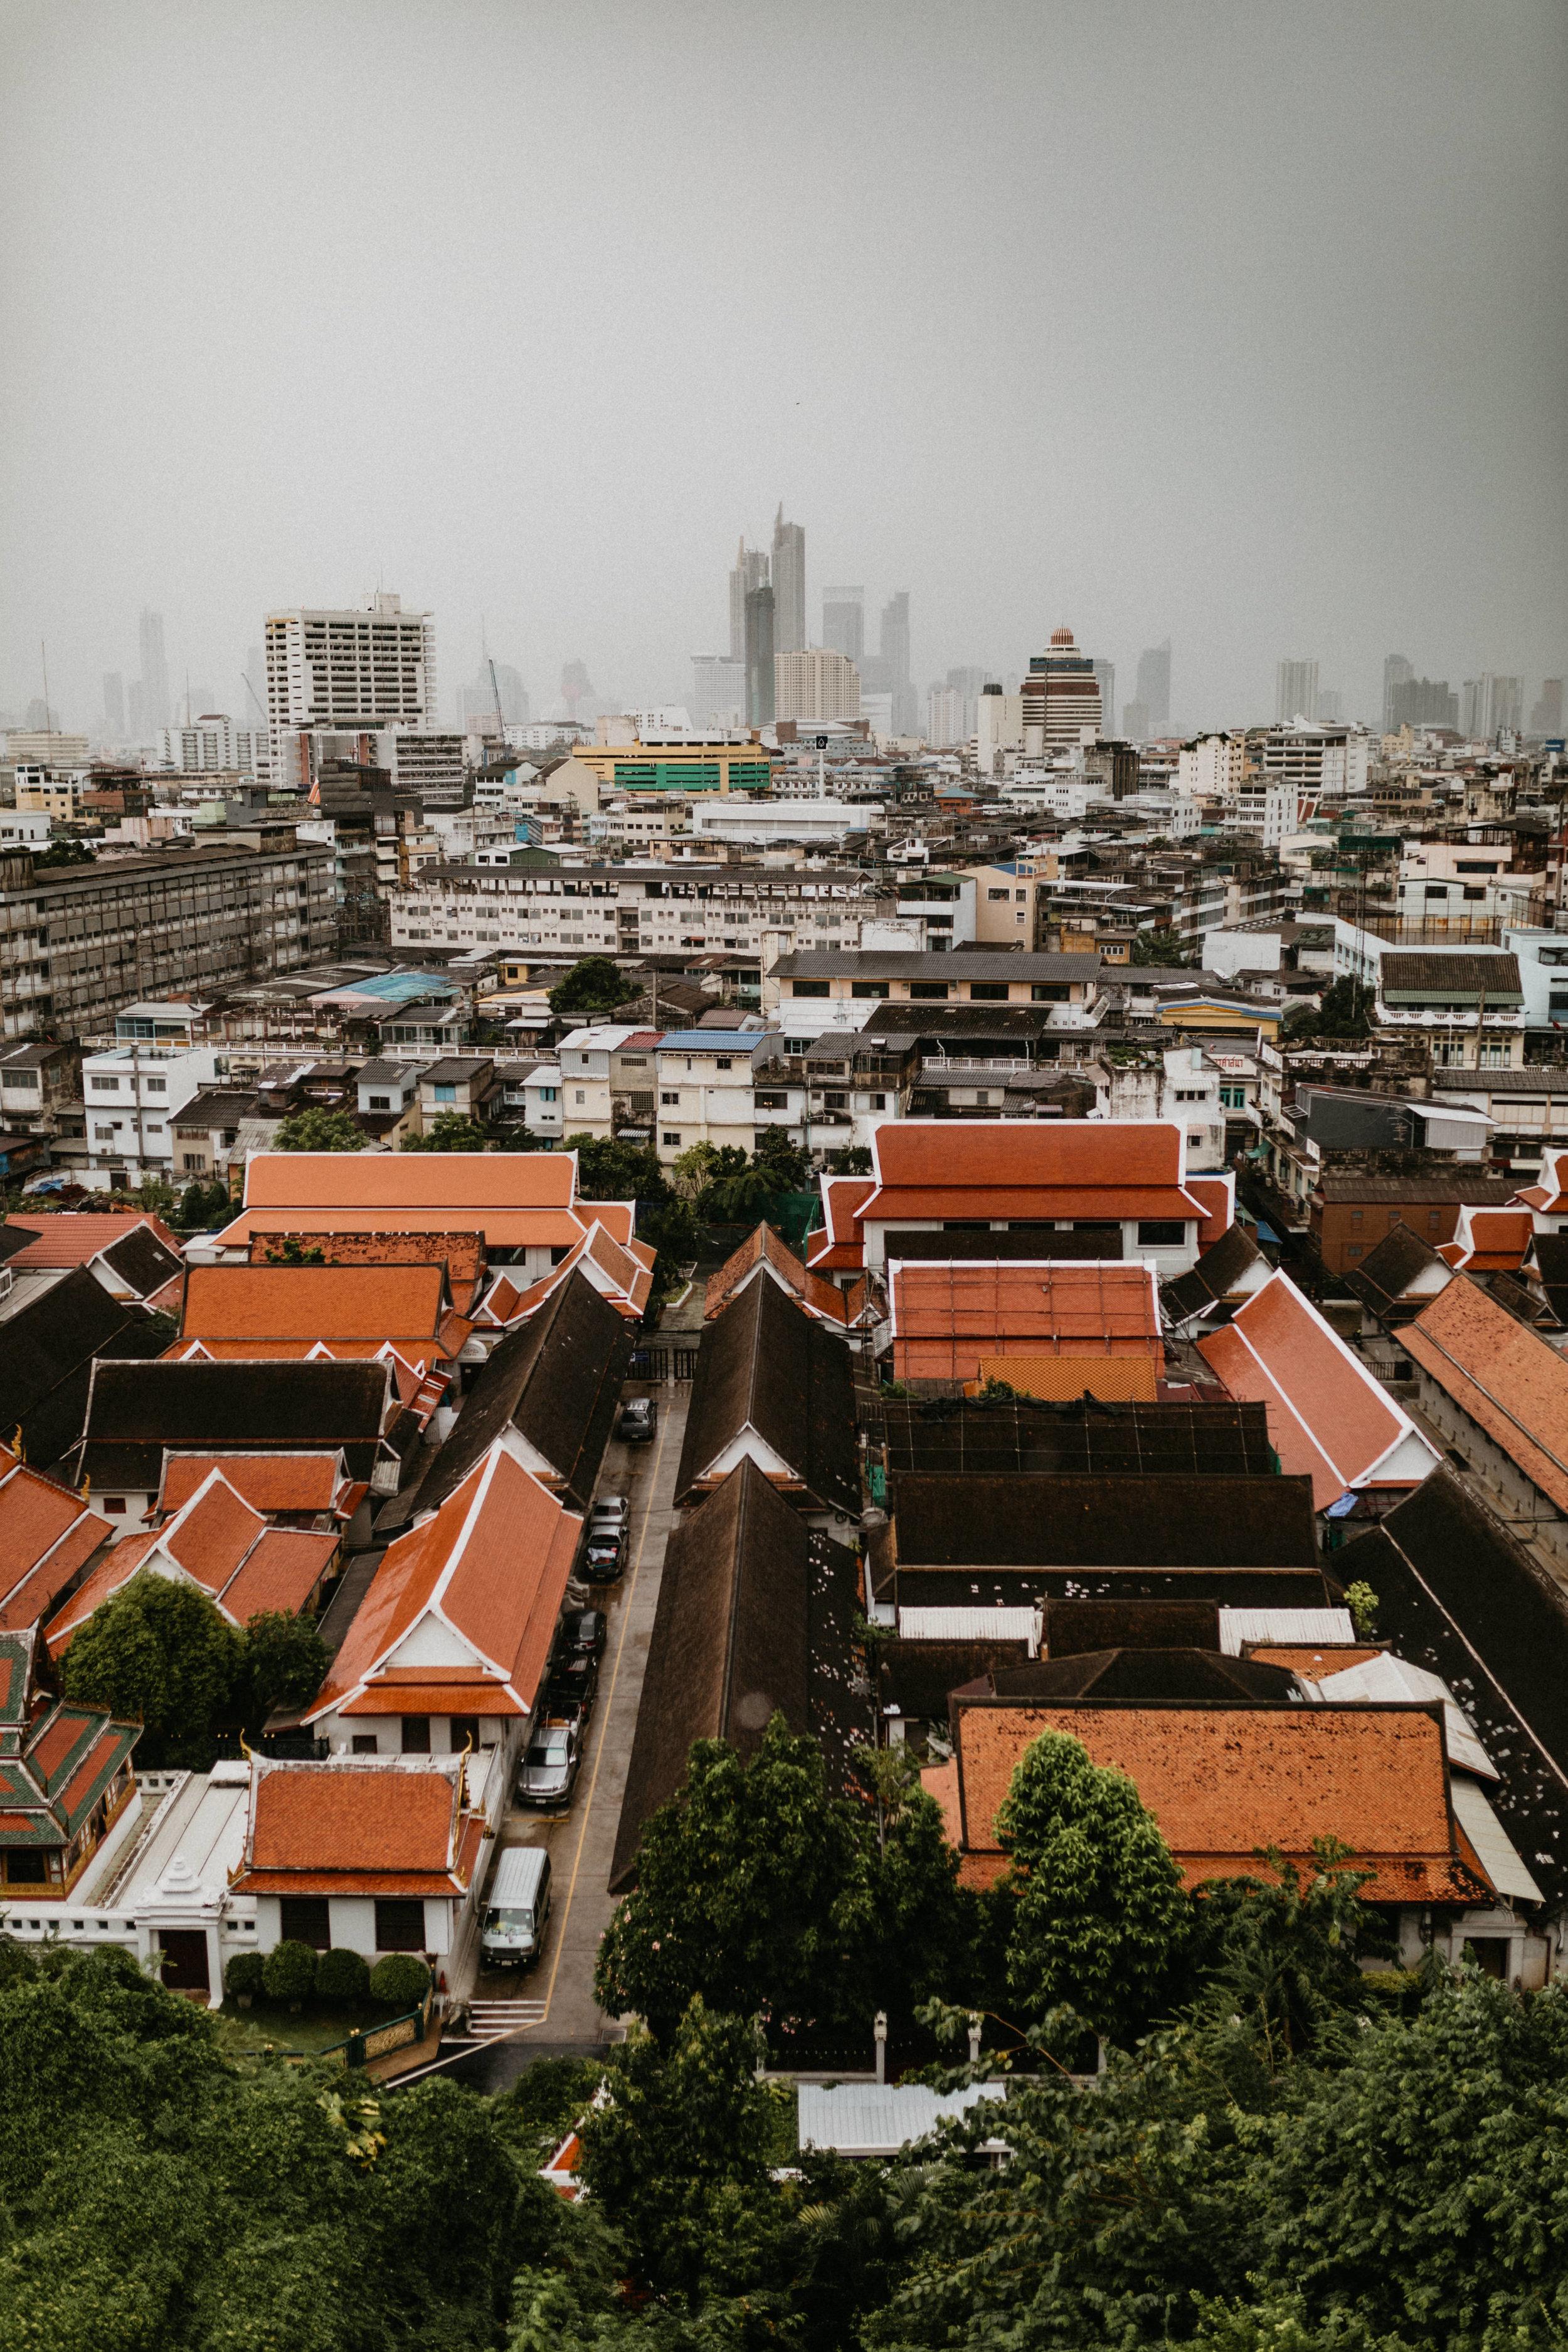 bangkok city skyline.jpg